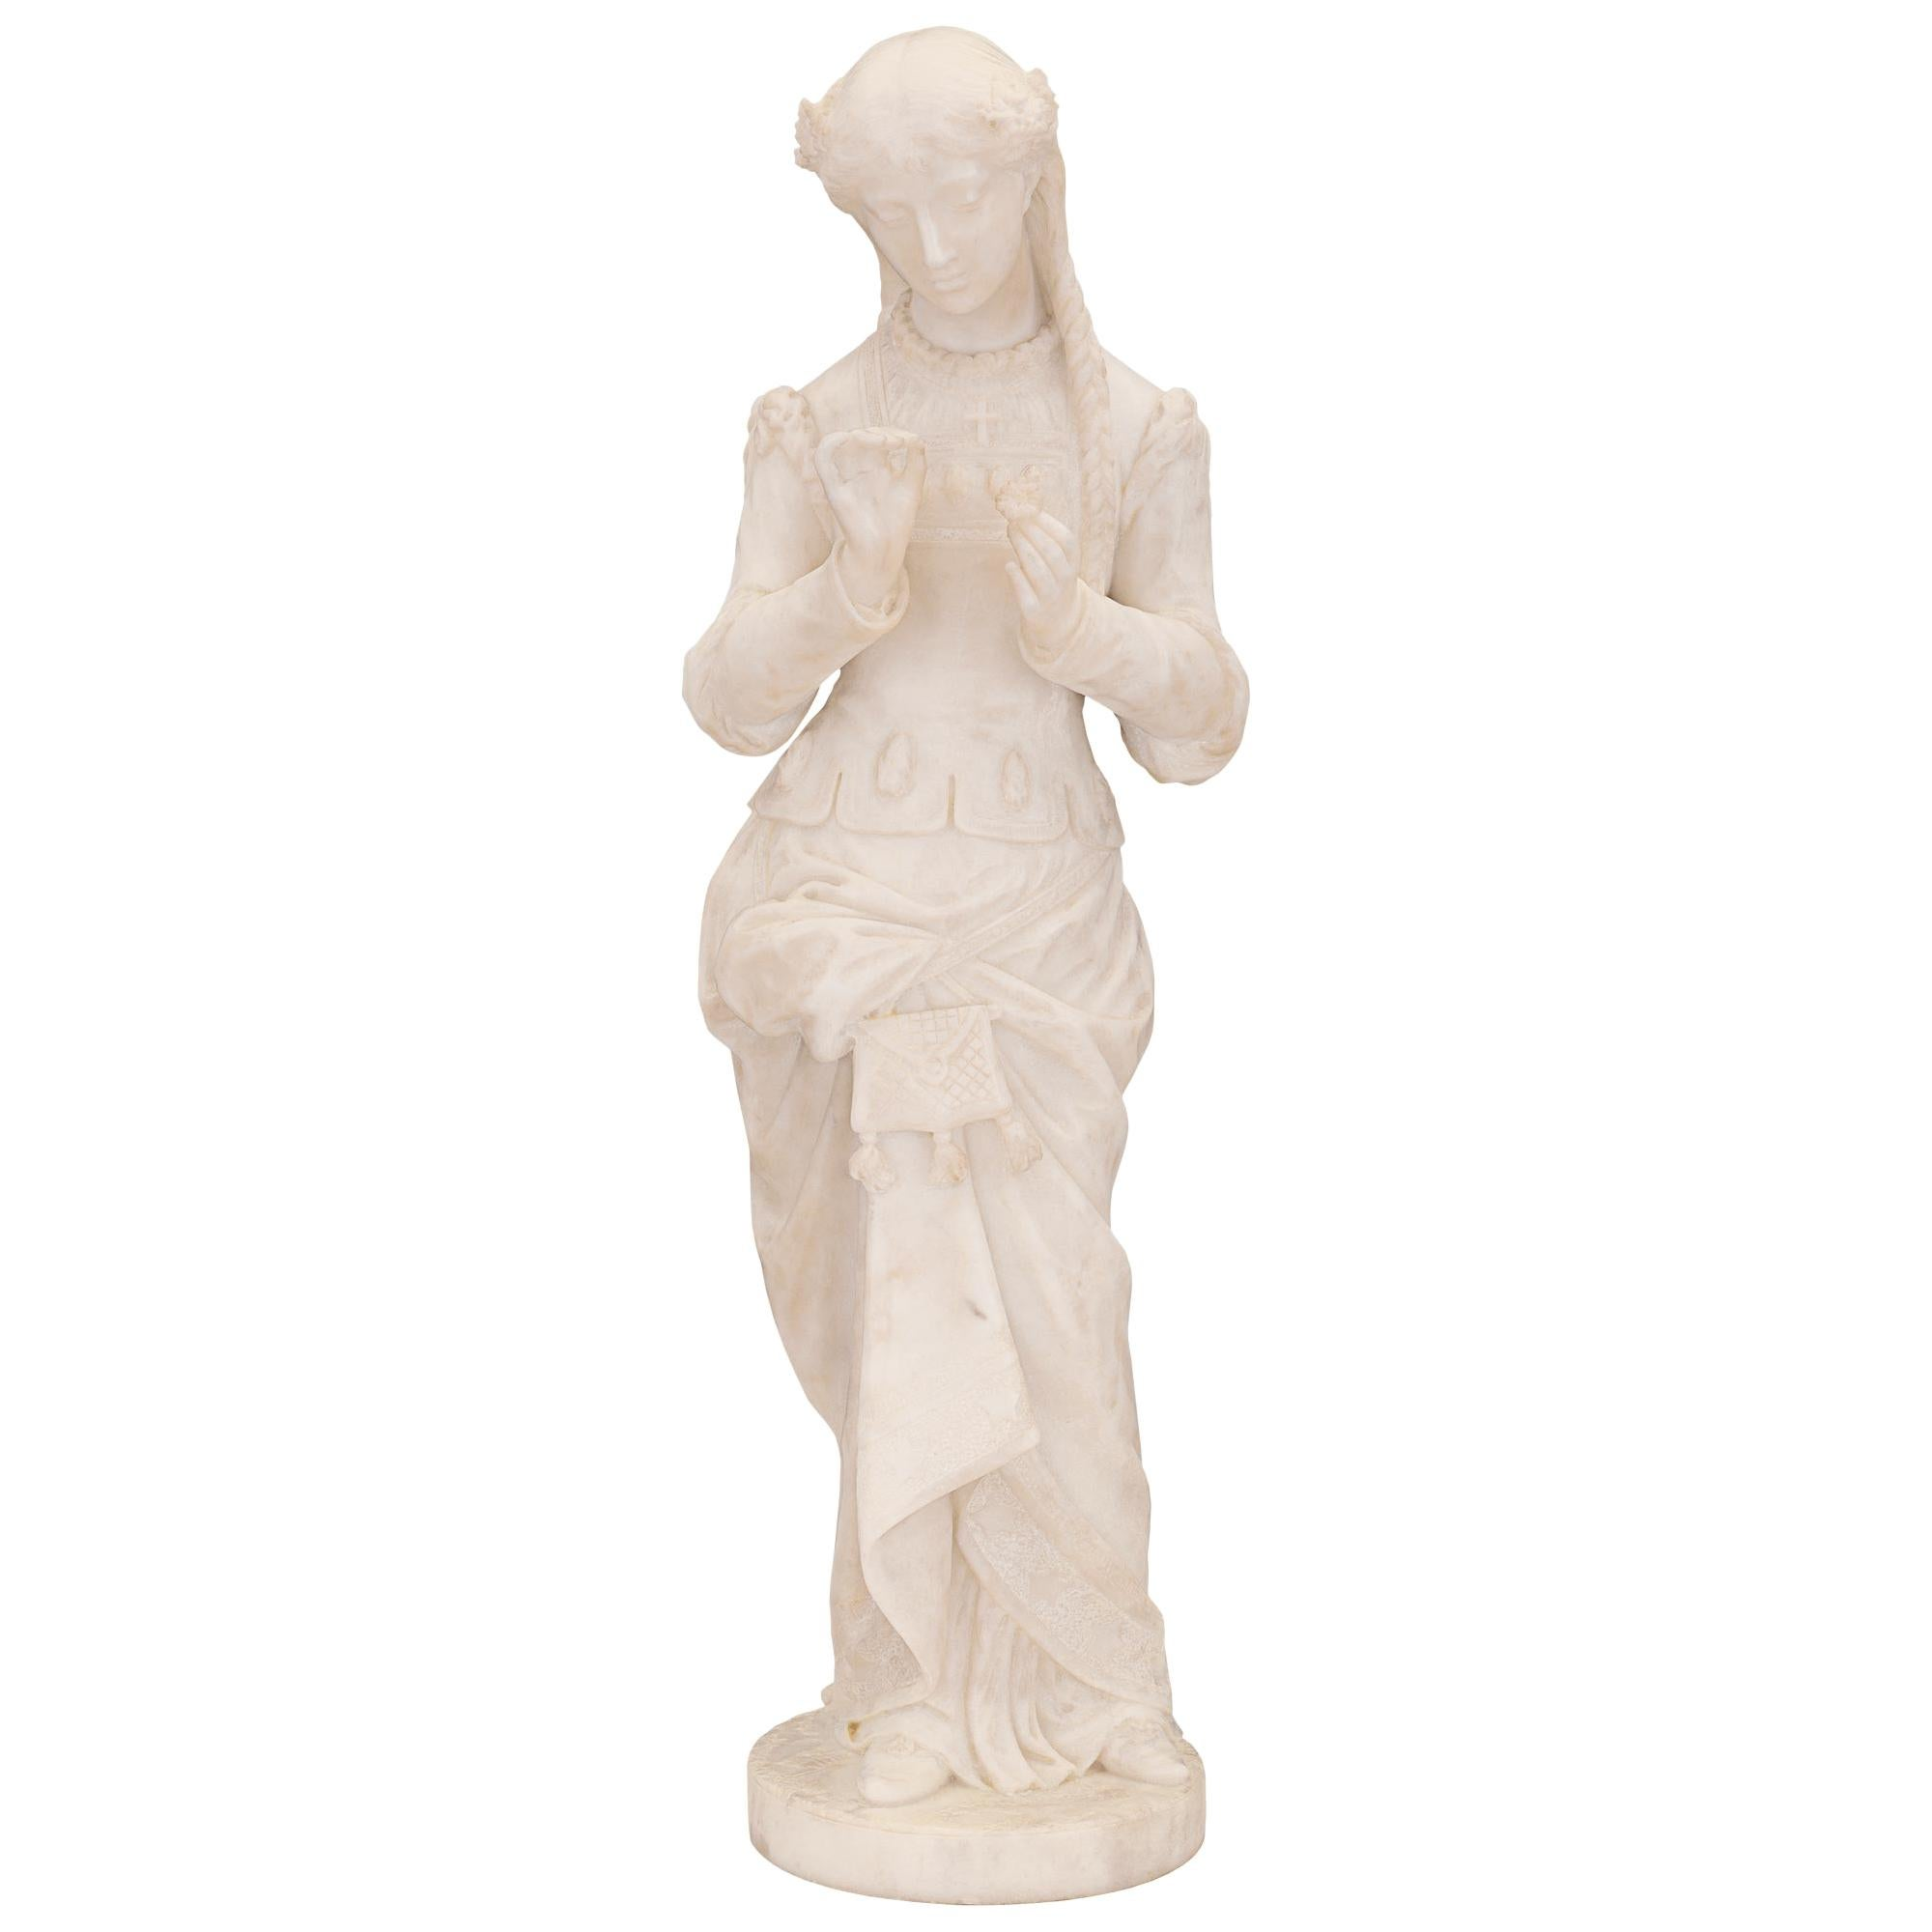 Italian 19th Century White Carrara Marble Statue, Signed P. Bazzanti Florence